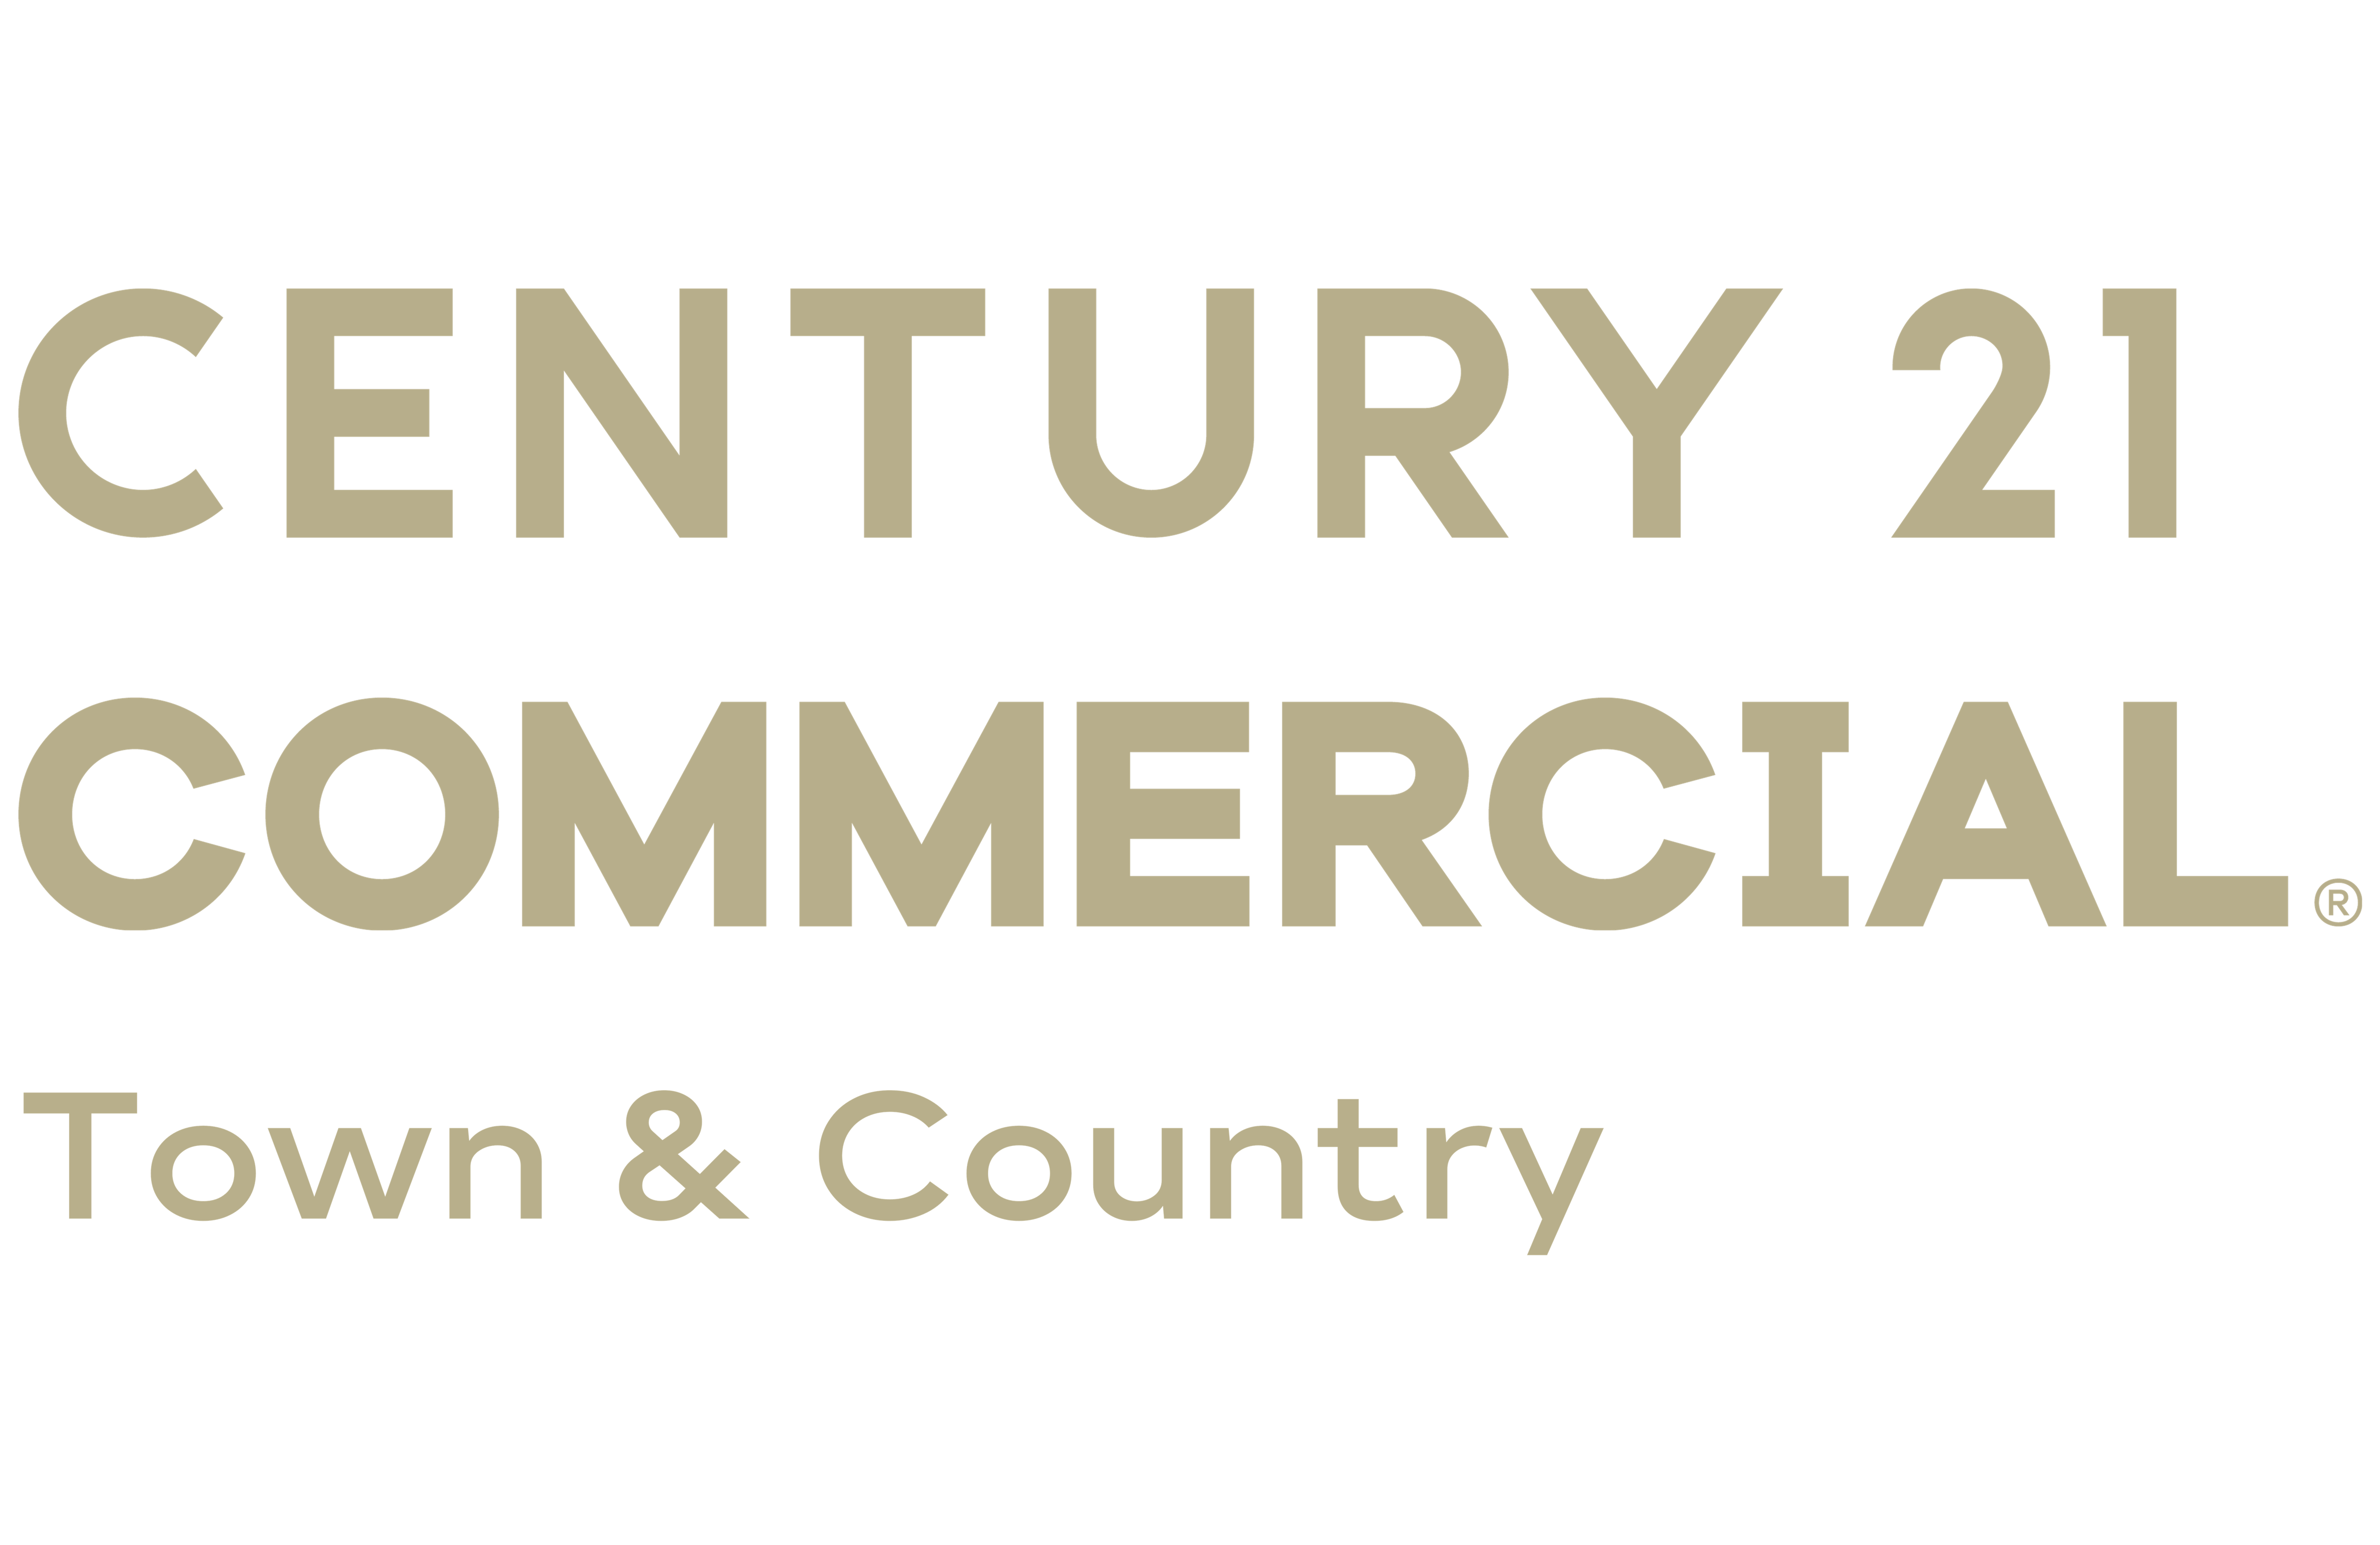 Nasim Ahmed of CENTURY 21 Town & Country logo